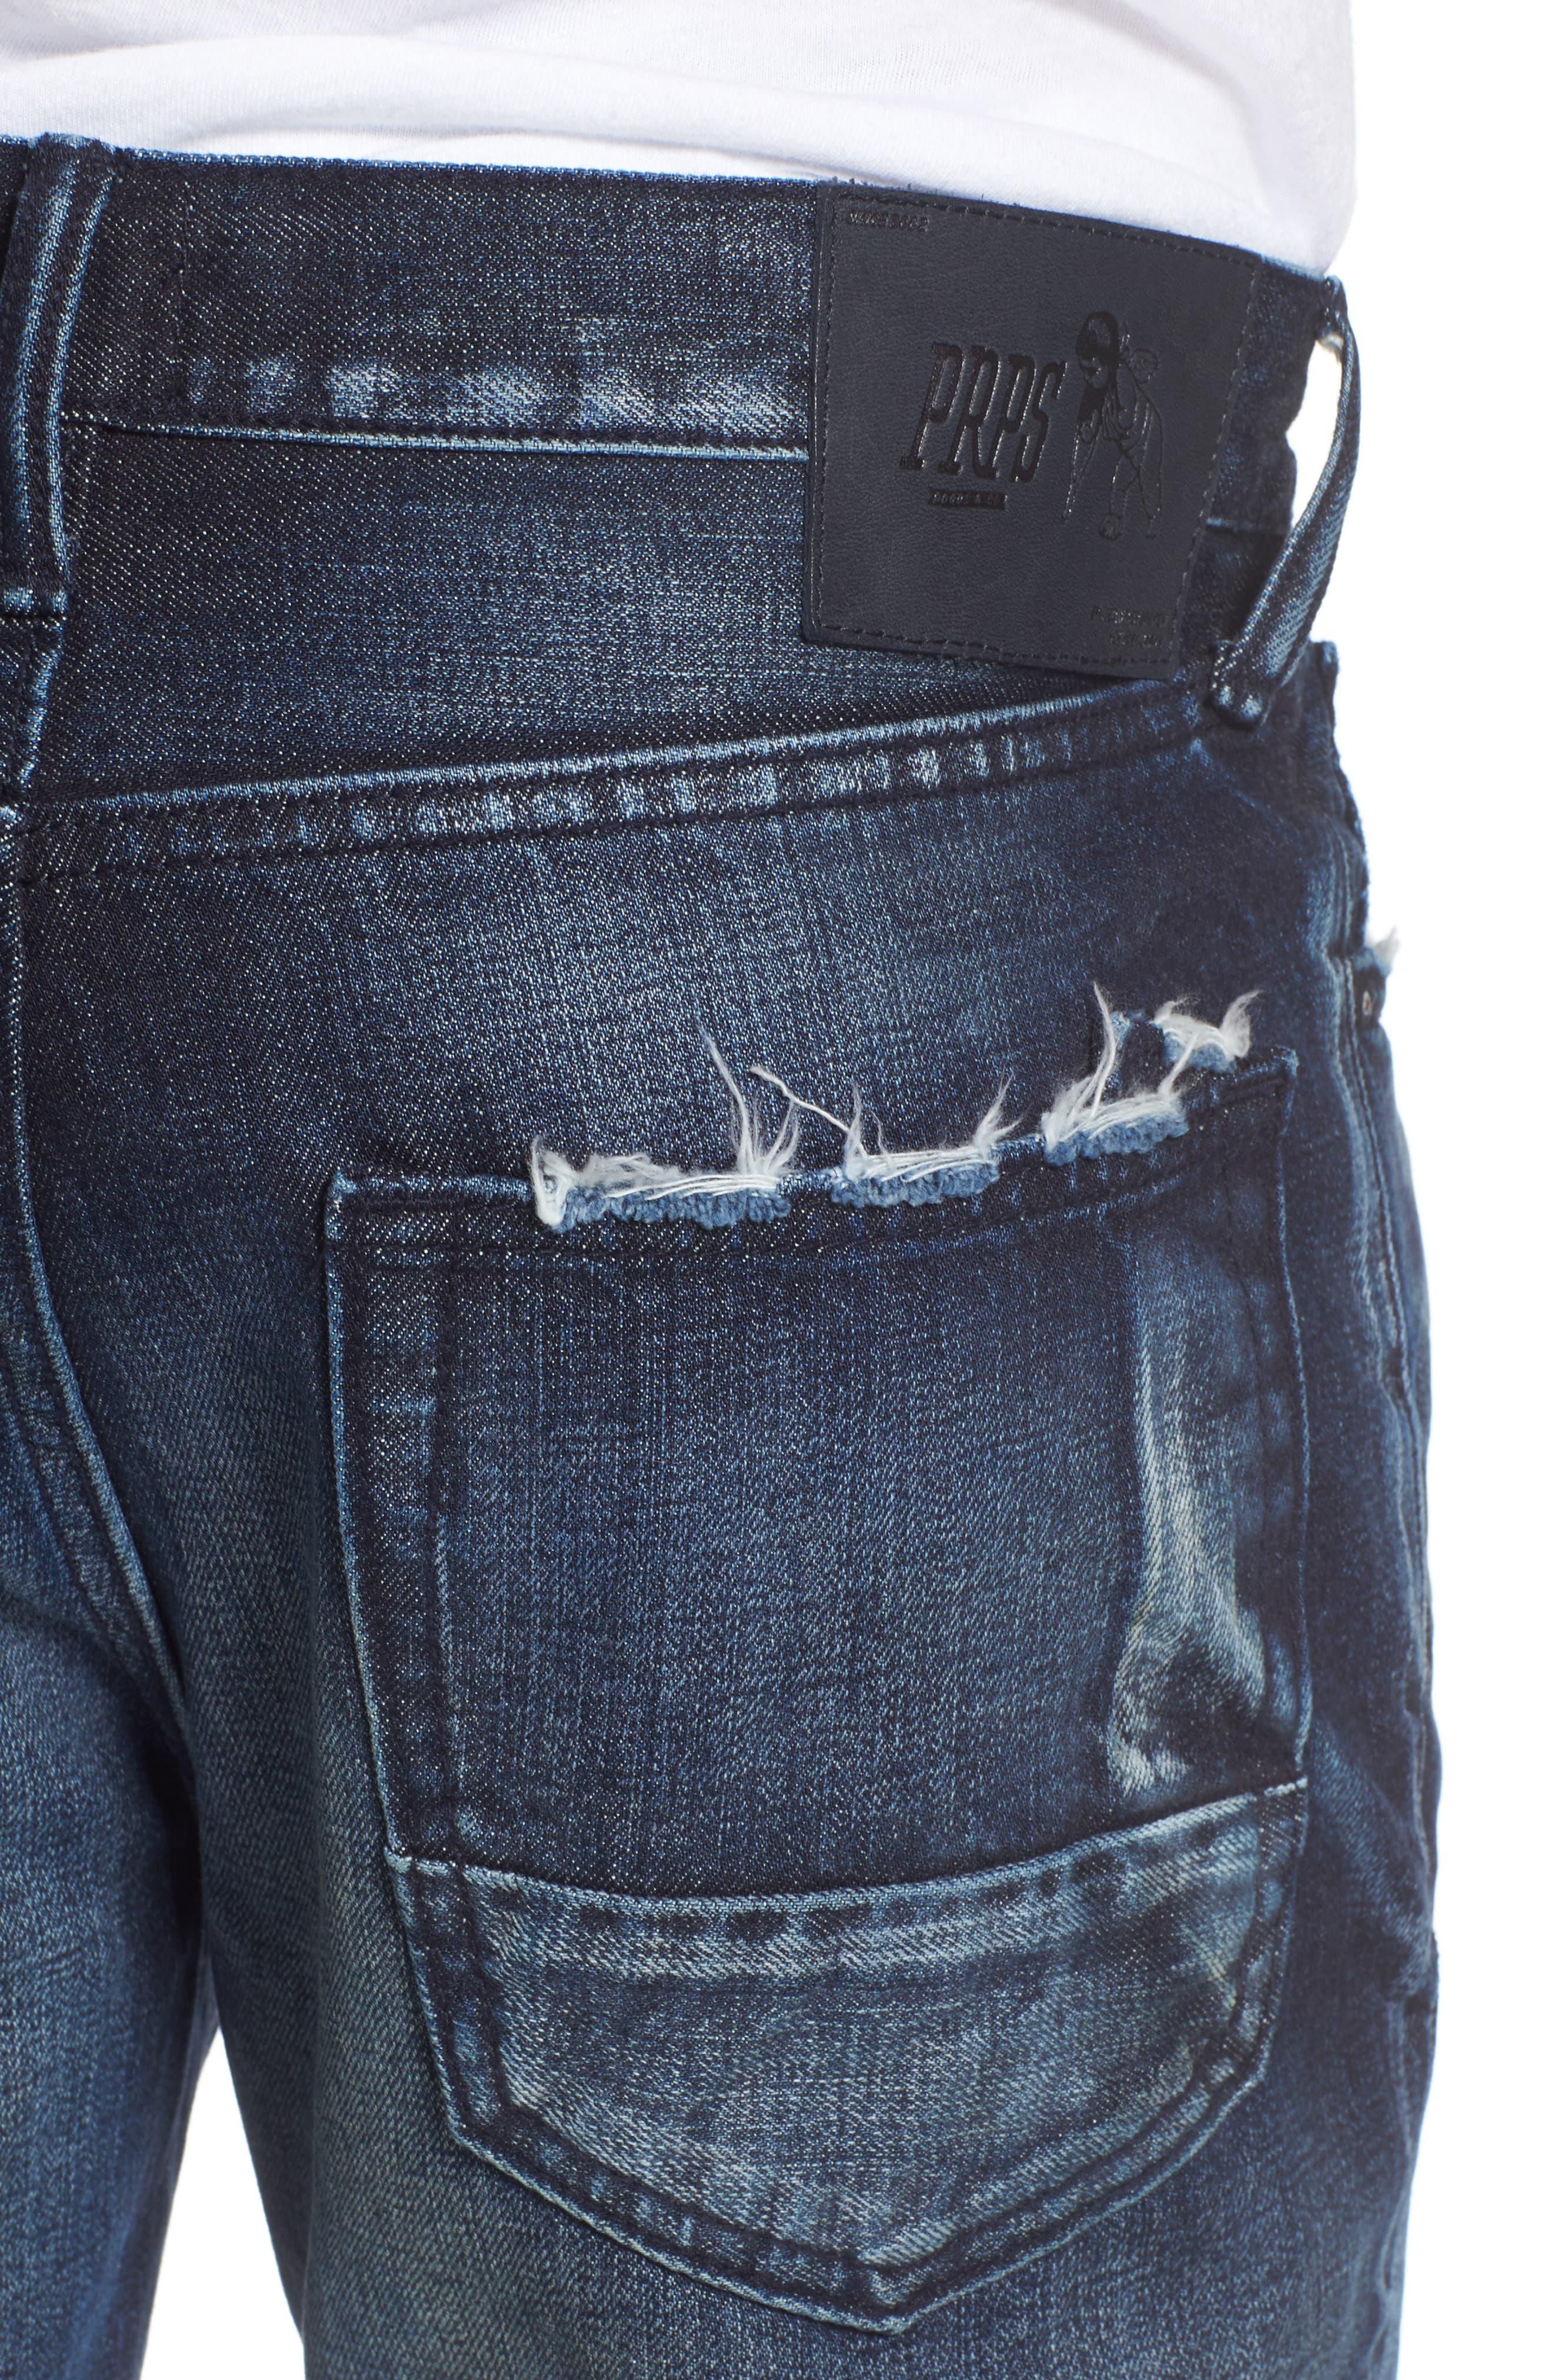 Demon Slim Straight Jeans,                             Alternate thumbnail 4, color,                             INDIGO